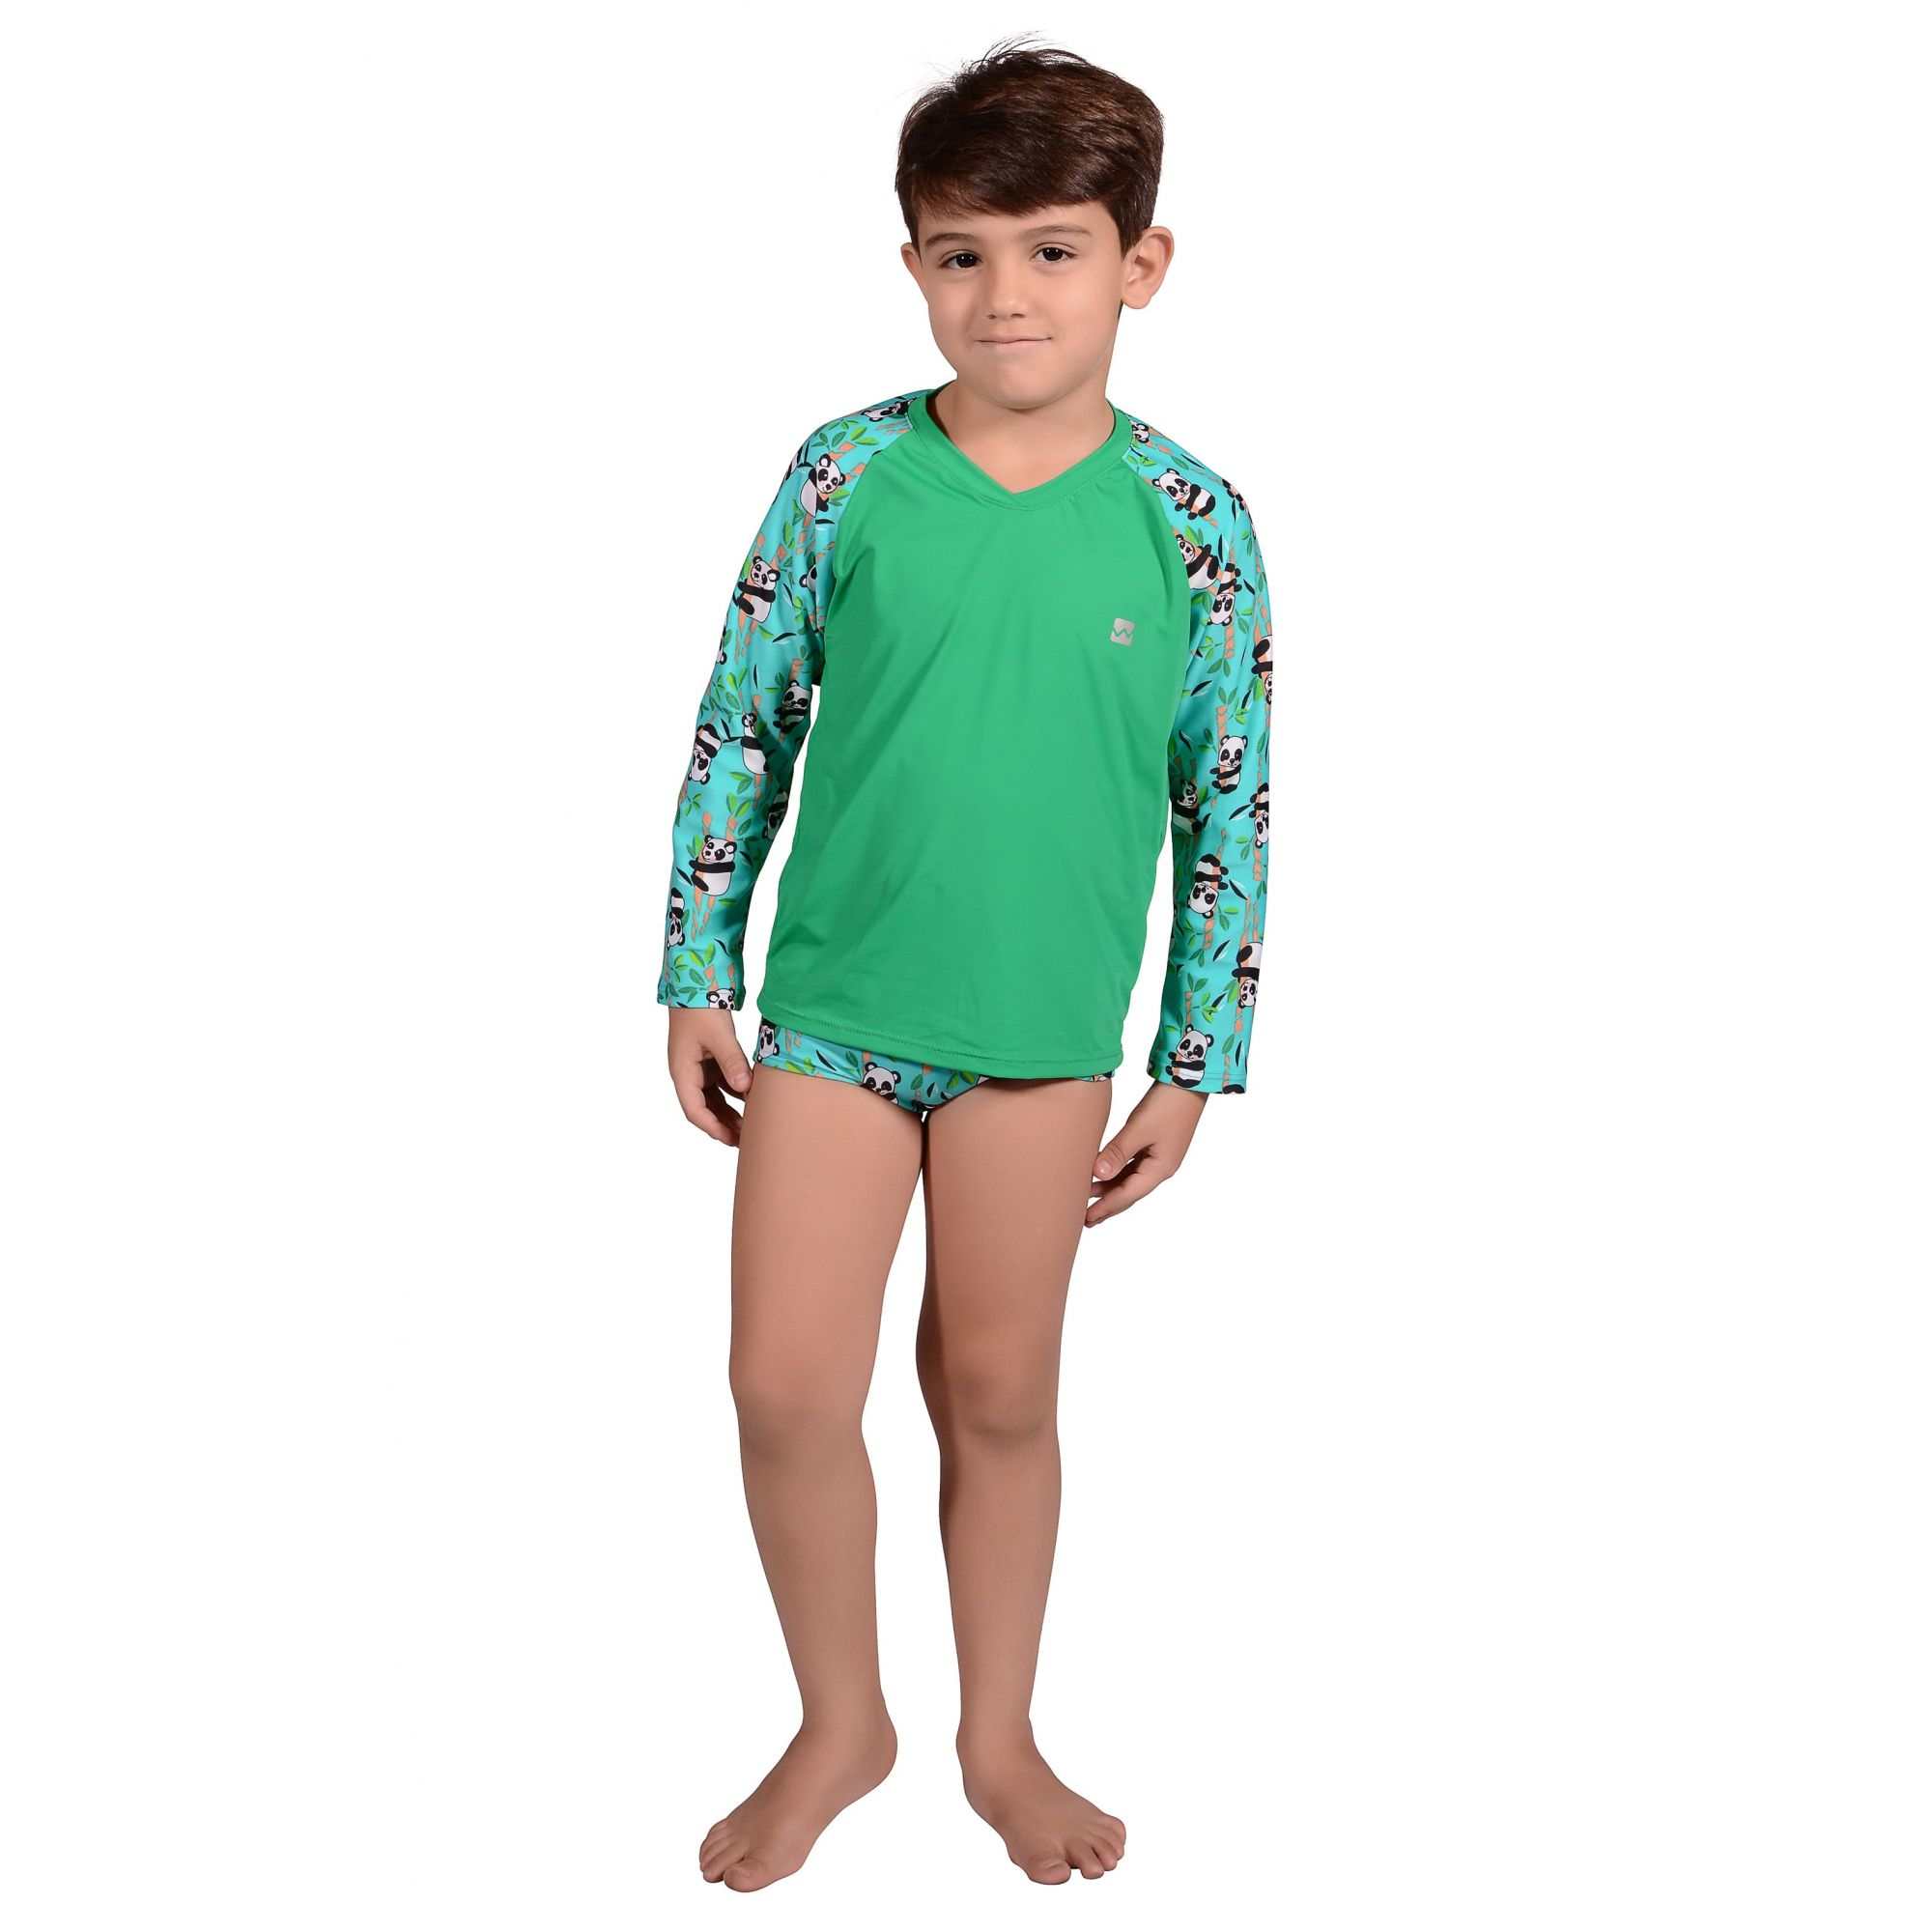 Camiseta Infantil Manga Longa UV 50+ Panda